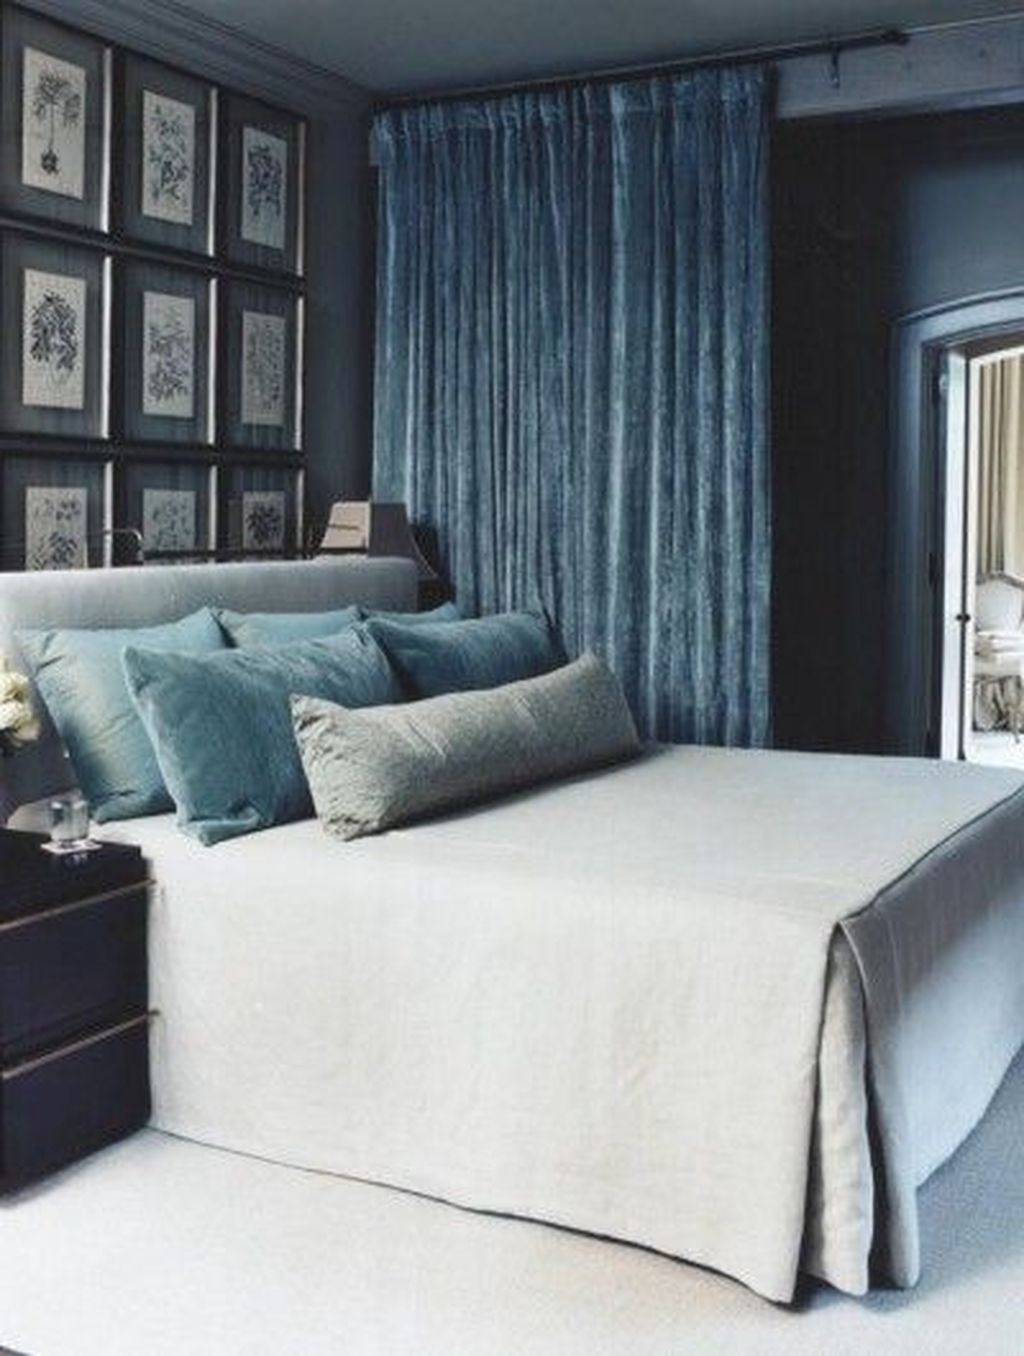 Master bedroom 2018 trends  Awesome  Elegant And Minimalist Master Bedroom Design Trends Ideas